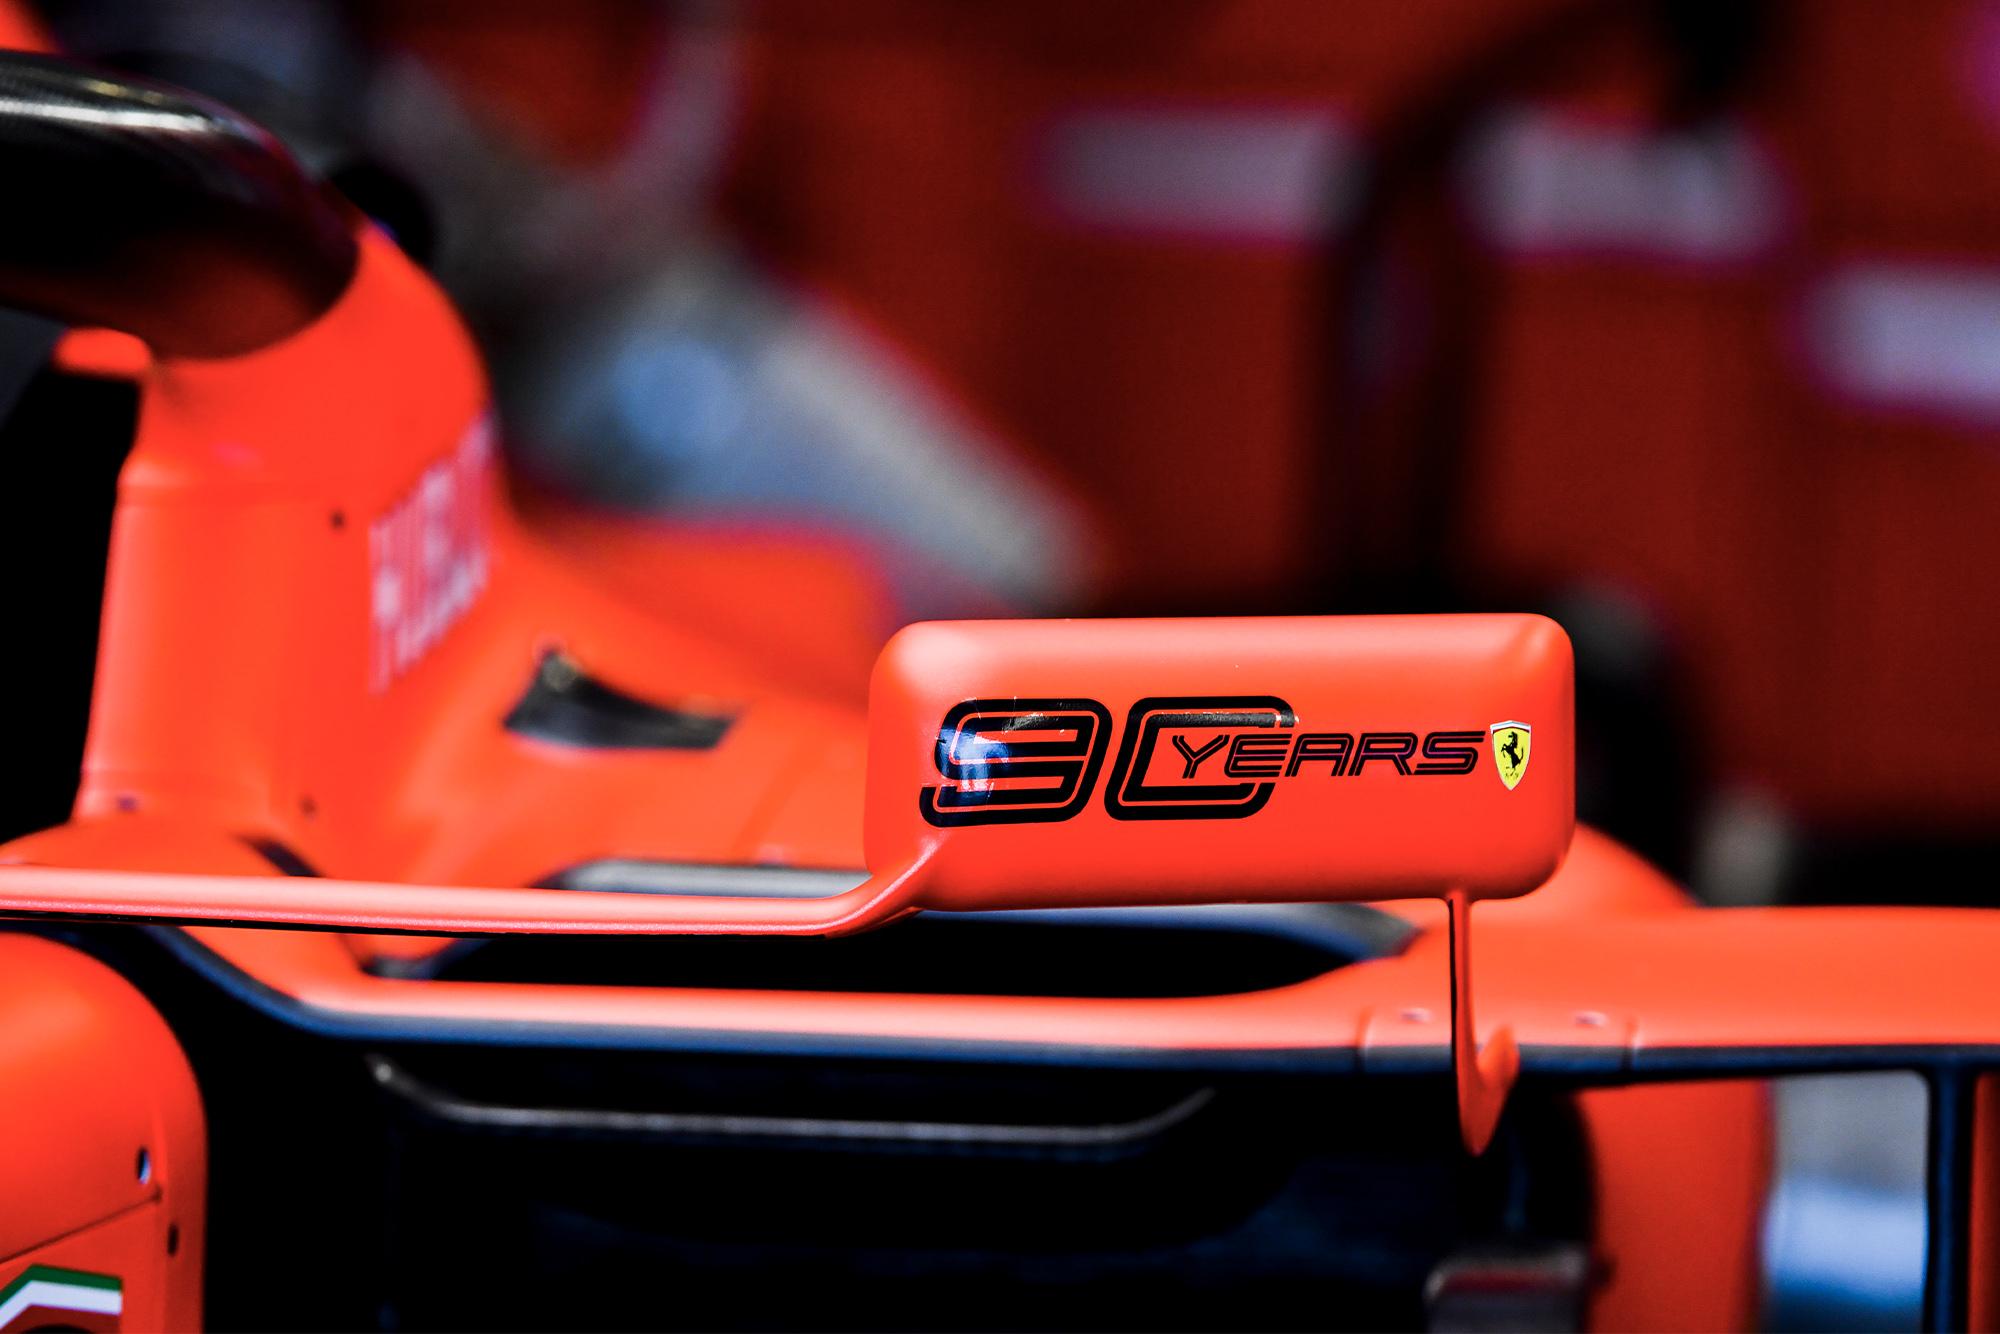 Ferrari celebrates 90 years in 2019